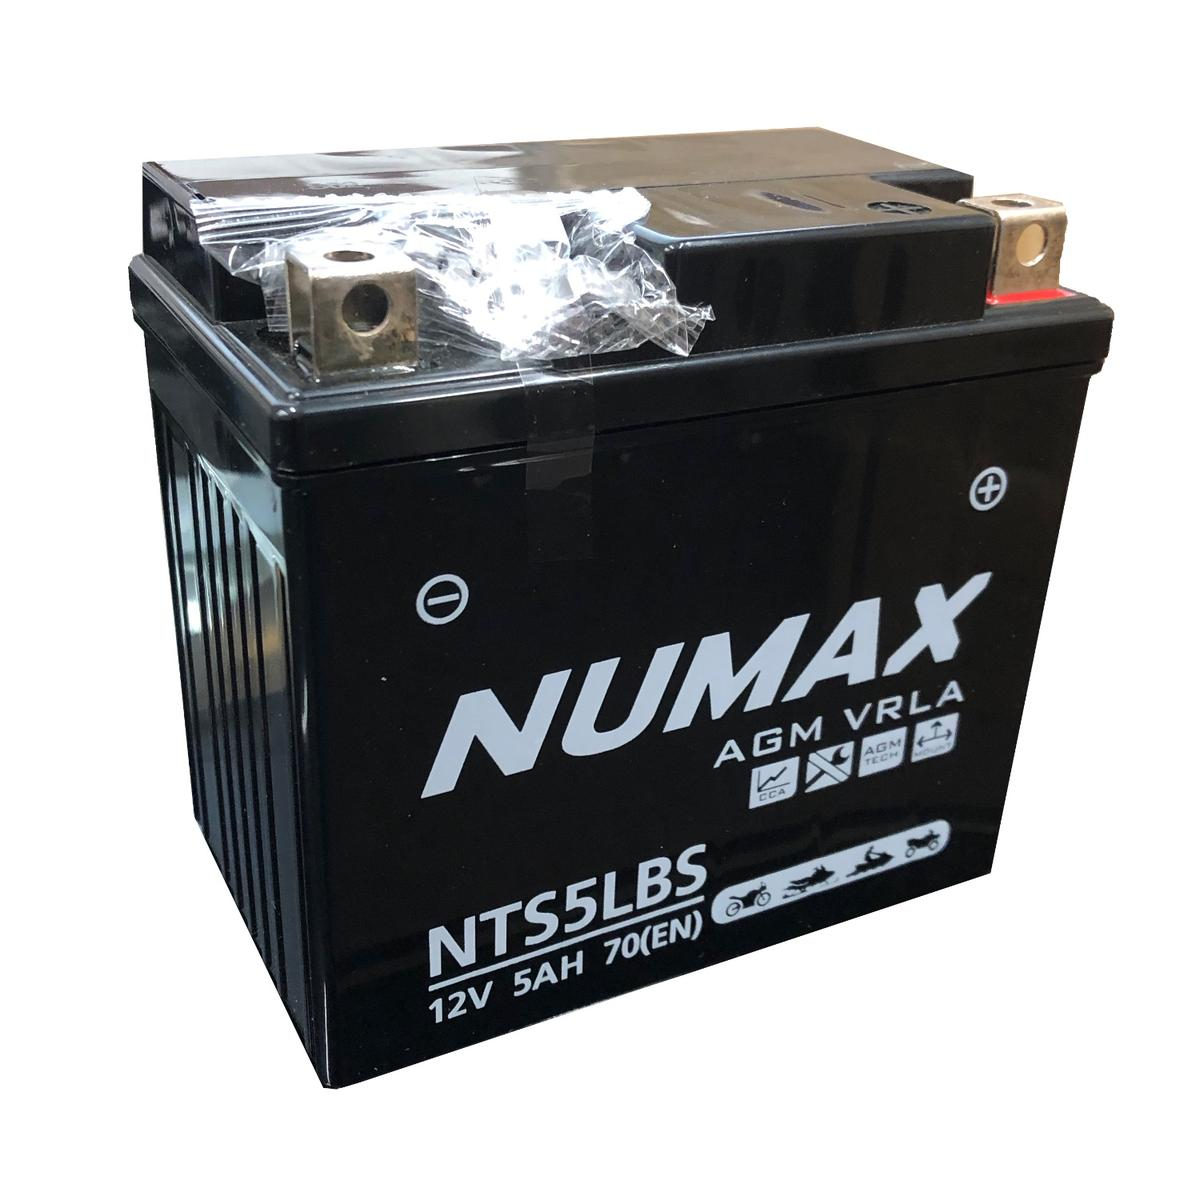 Numax 12v NTS5LBS Motorbike Bike Battery HONDA 230cc CRF230F YTX5L-4